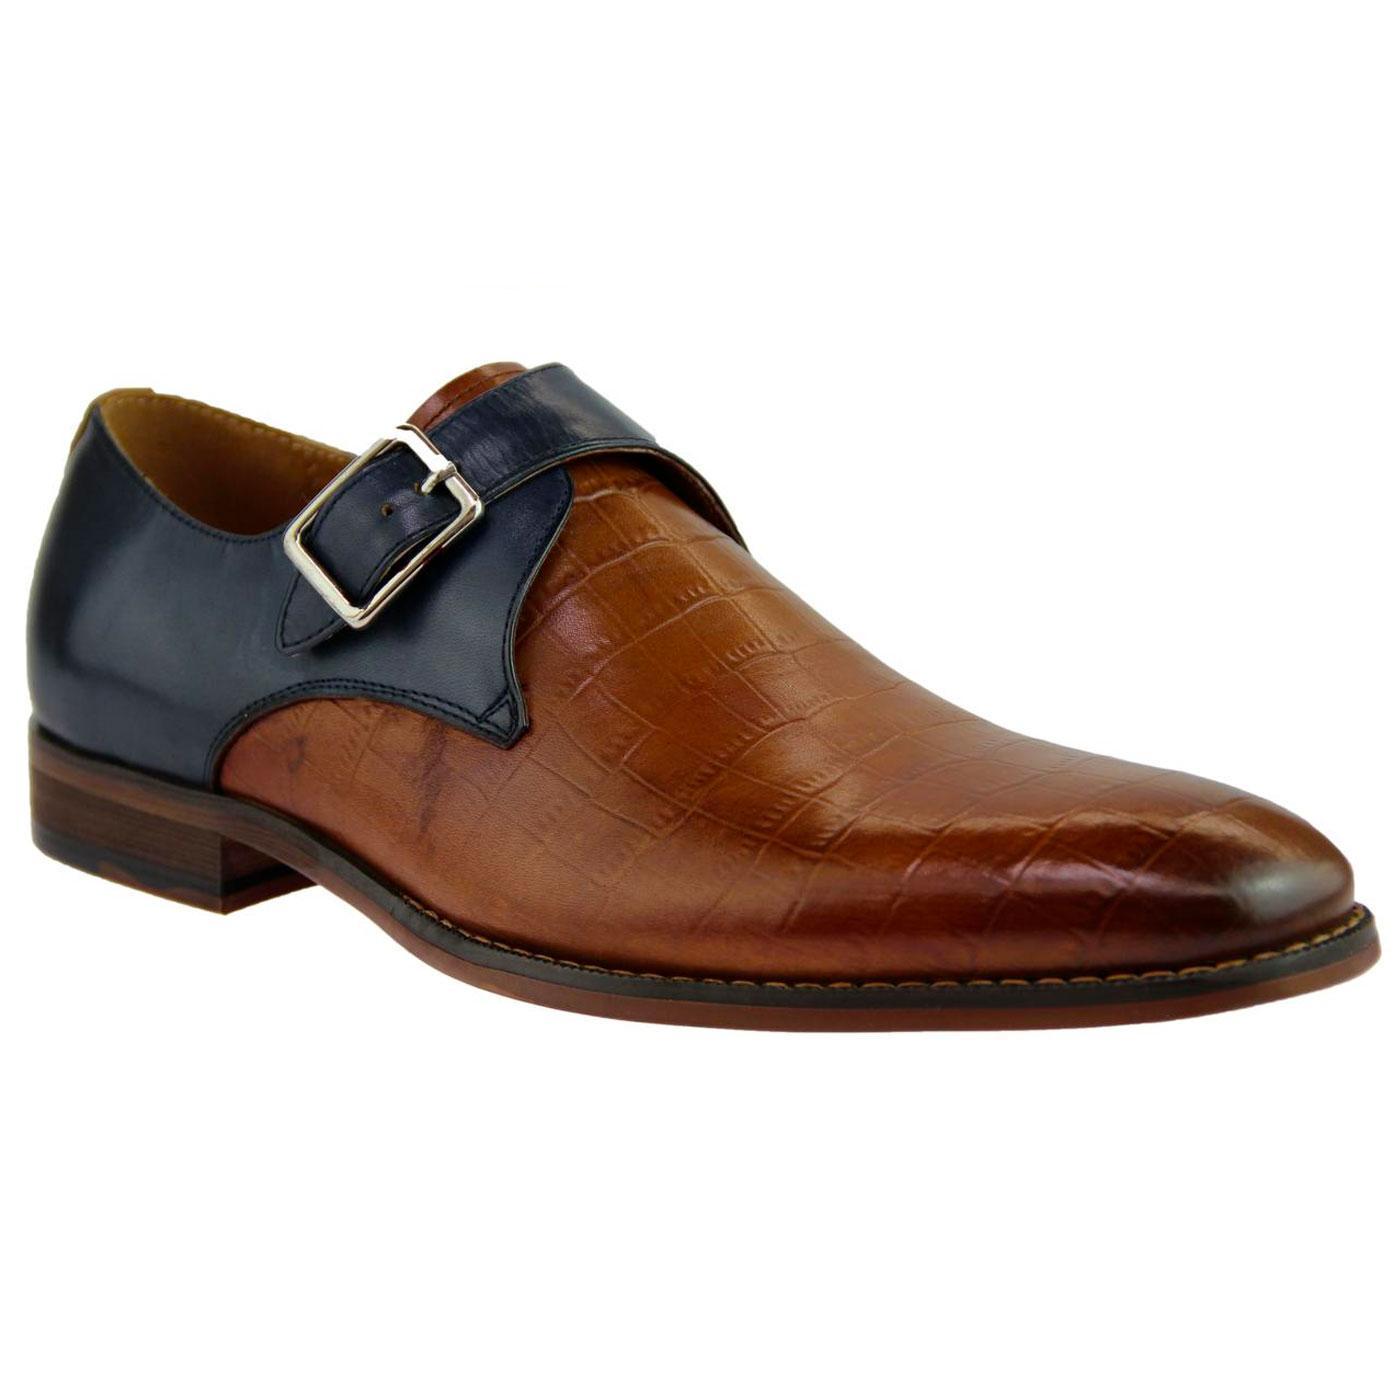 Jordi SERGIO DULETTI Retro Croc Stamp Monk Shoes